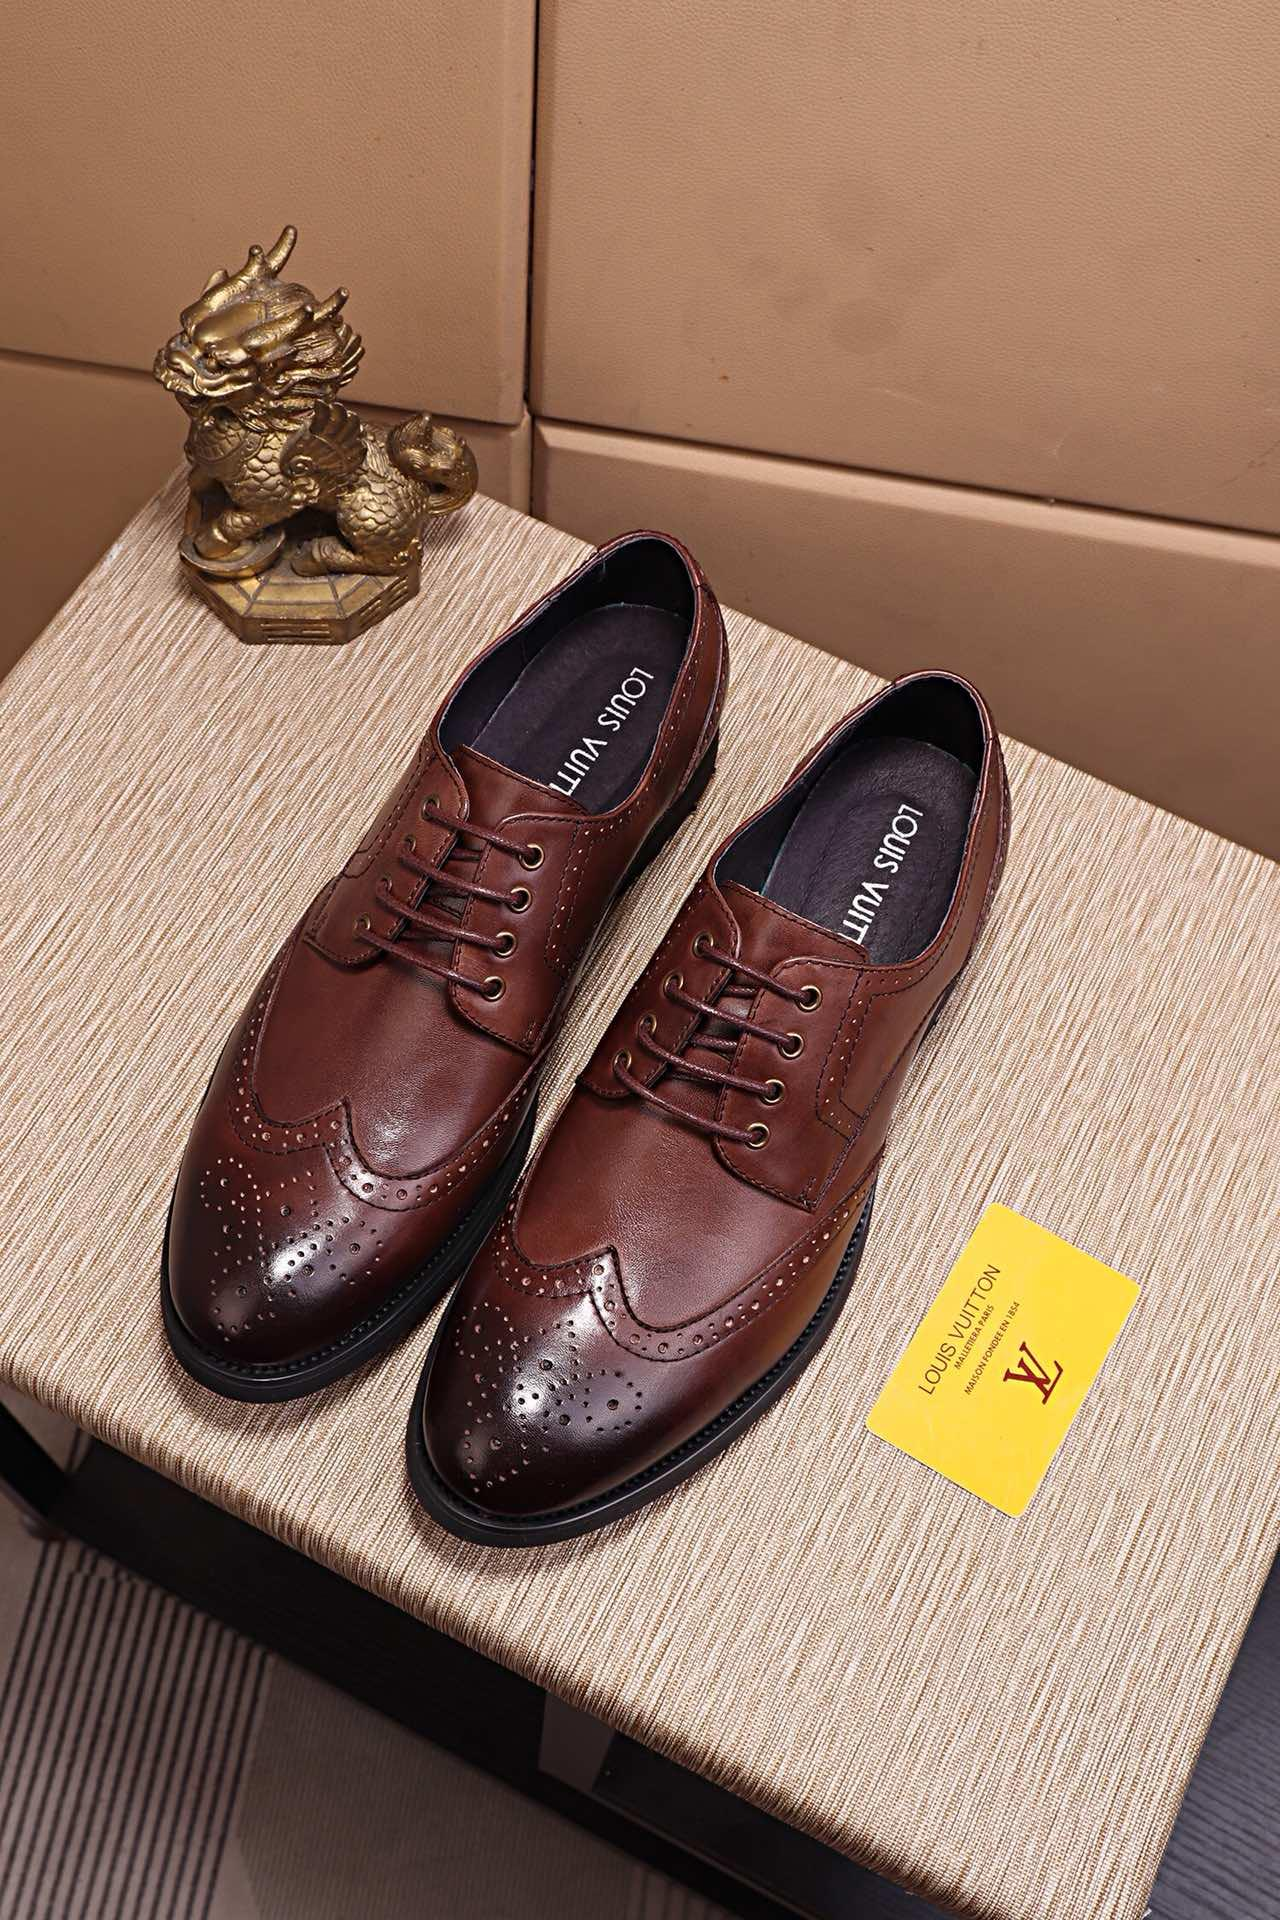 Louis Vuitton ルイヴィトン スーパーコピー 代引き 靴 メンズ 2色